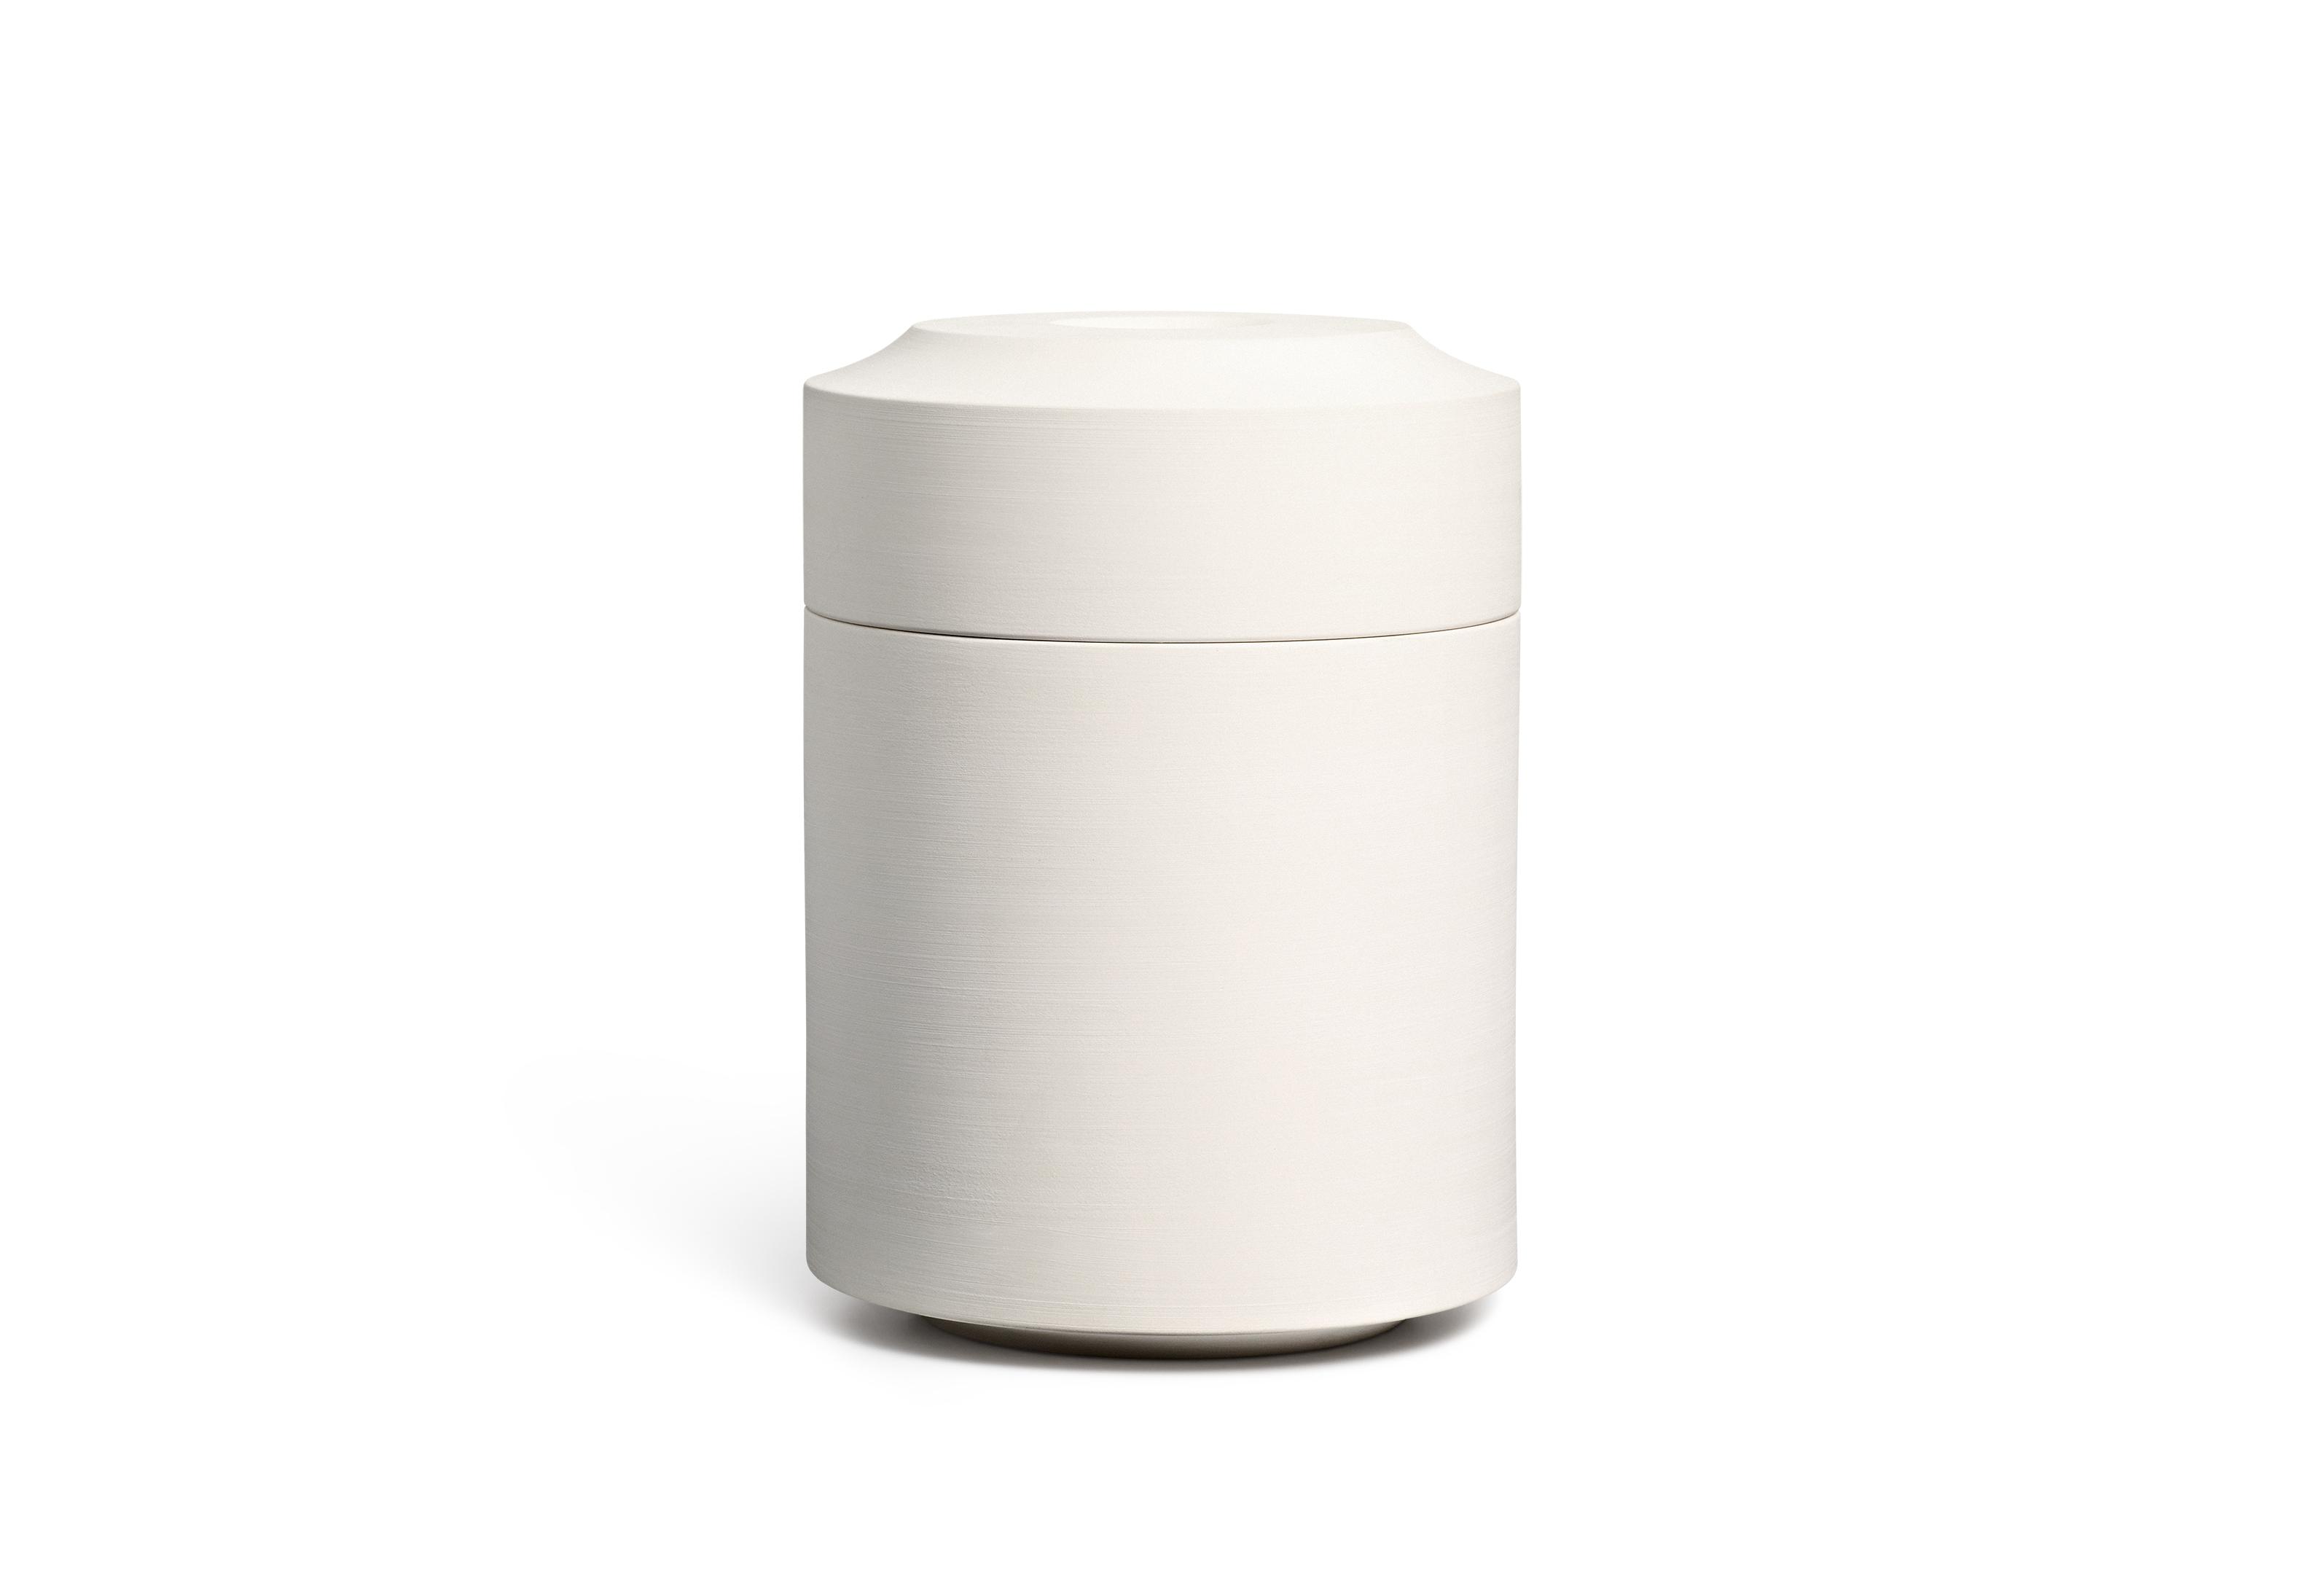 Keramik / glasiert / matt<br />Farbe: snow<br />H 29cm, DM 21cm